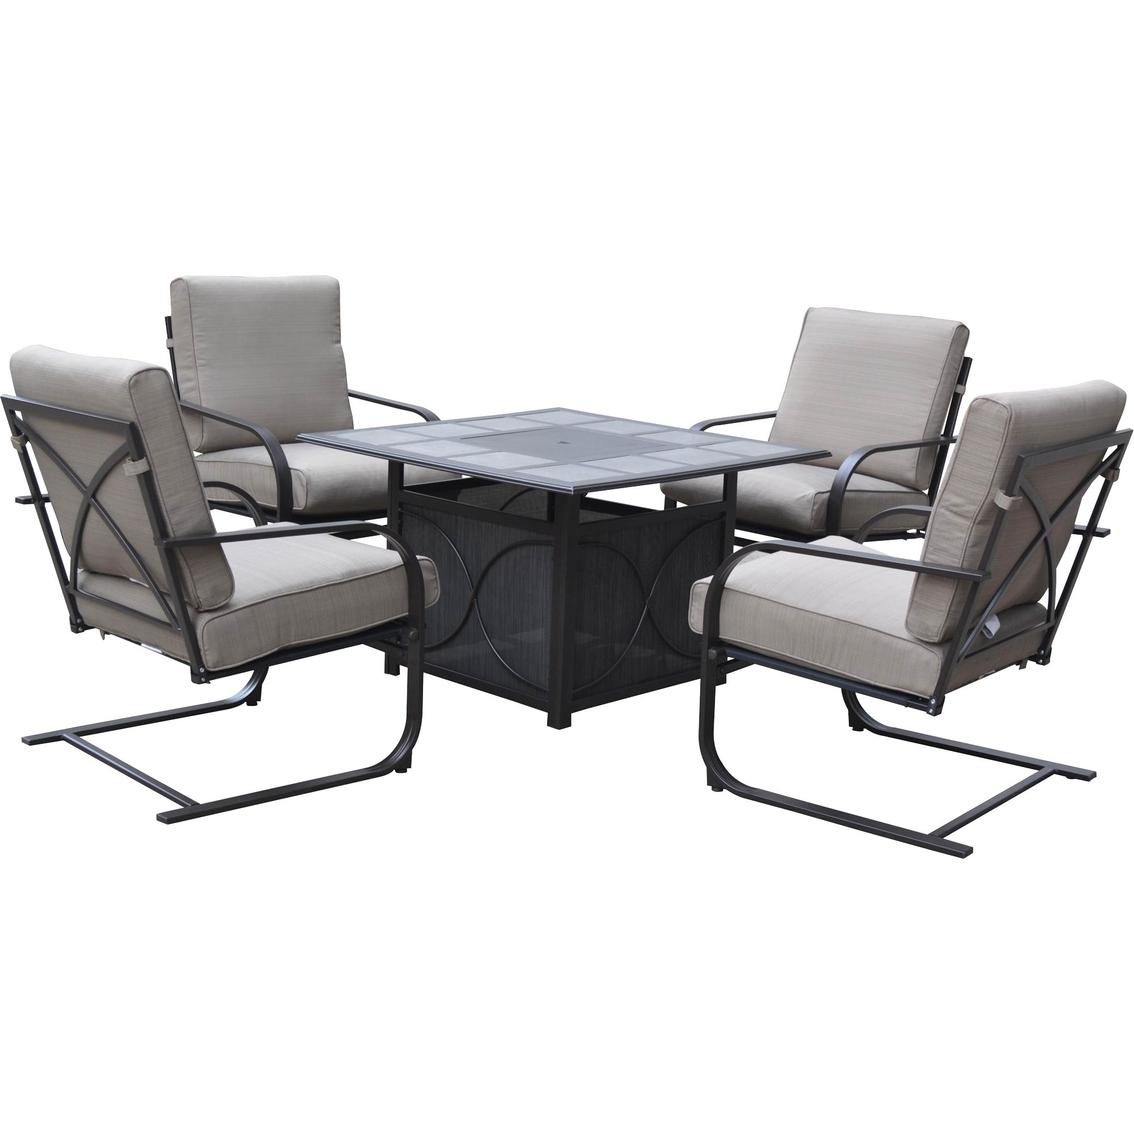 Courtyard Creations Patio Furniture #18: Shop My Exchange